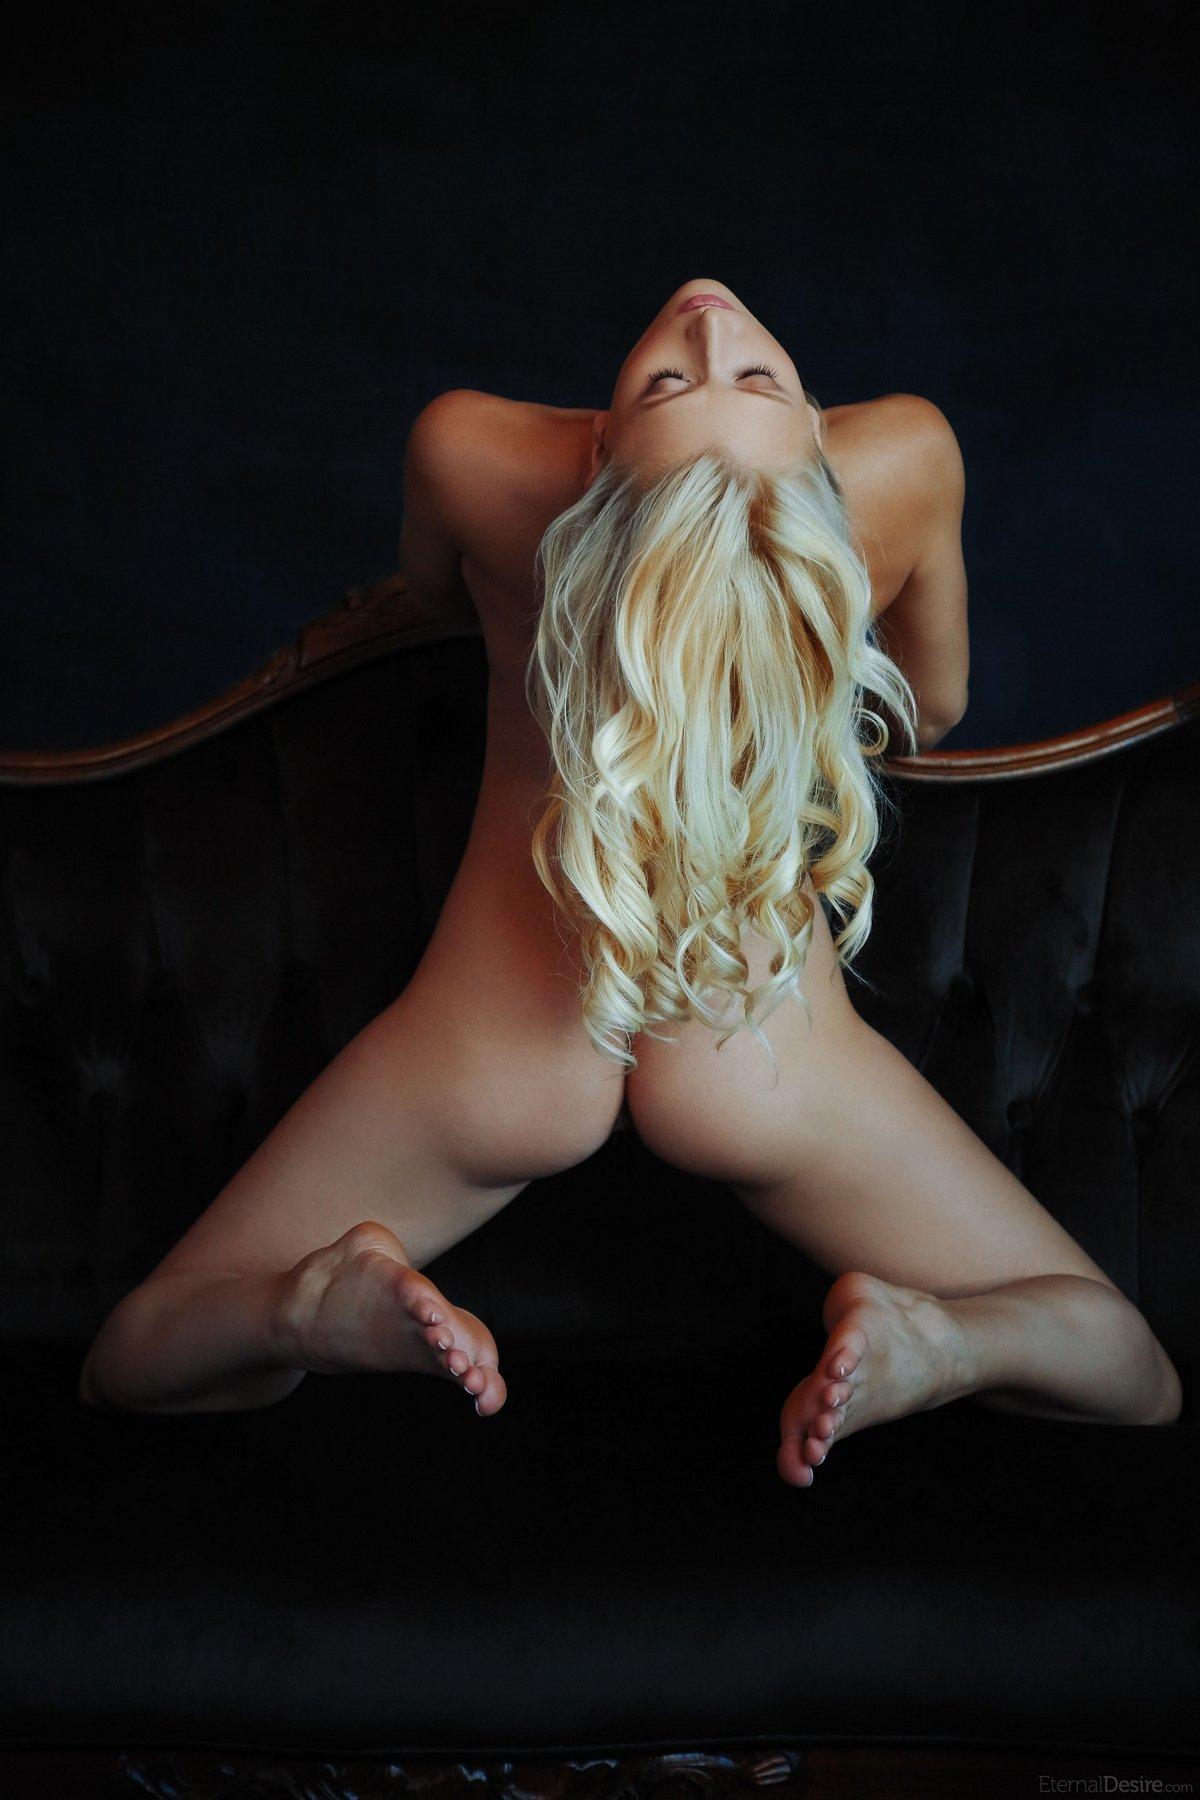 Милашка Nika разводит длинные ноги на чёрном диванчике